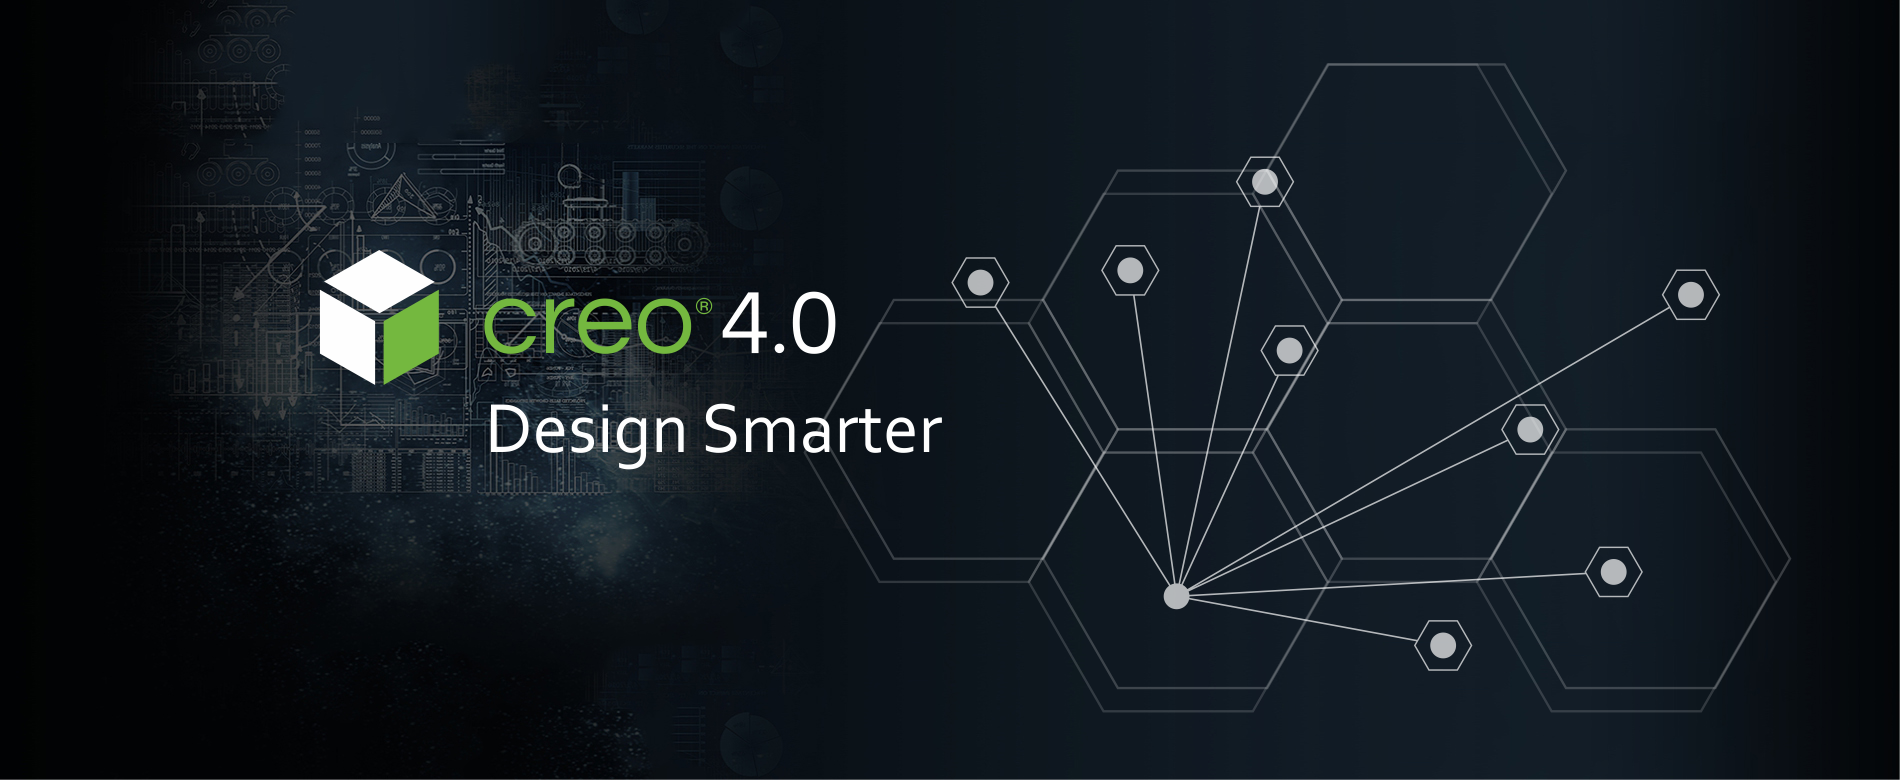 New Creo 4.0